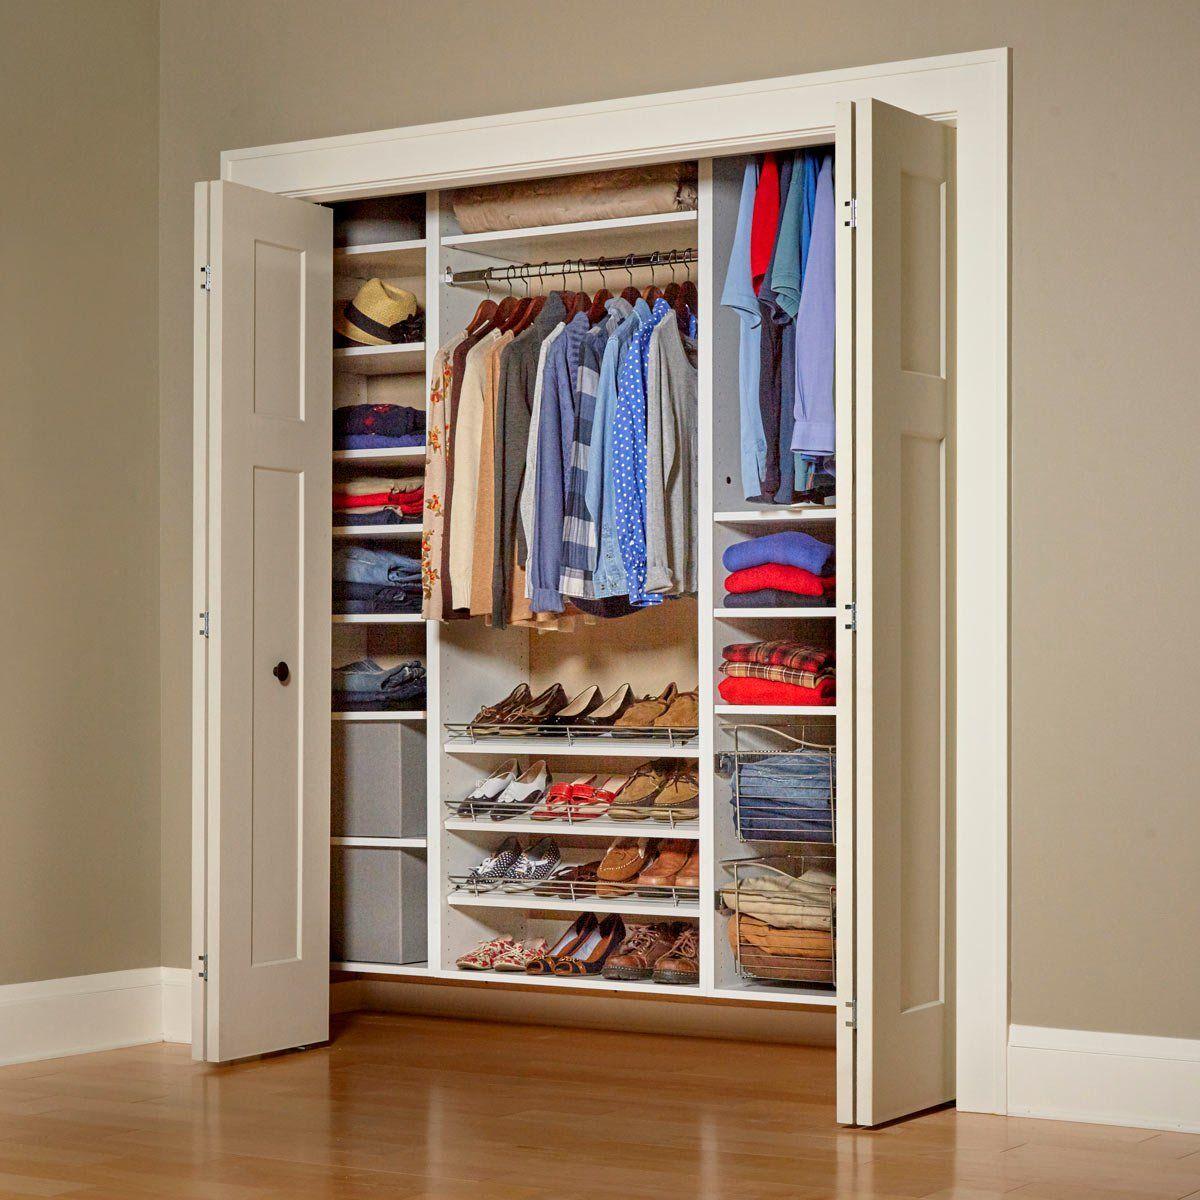 Melamine type closet organiser